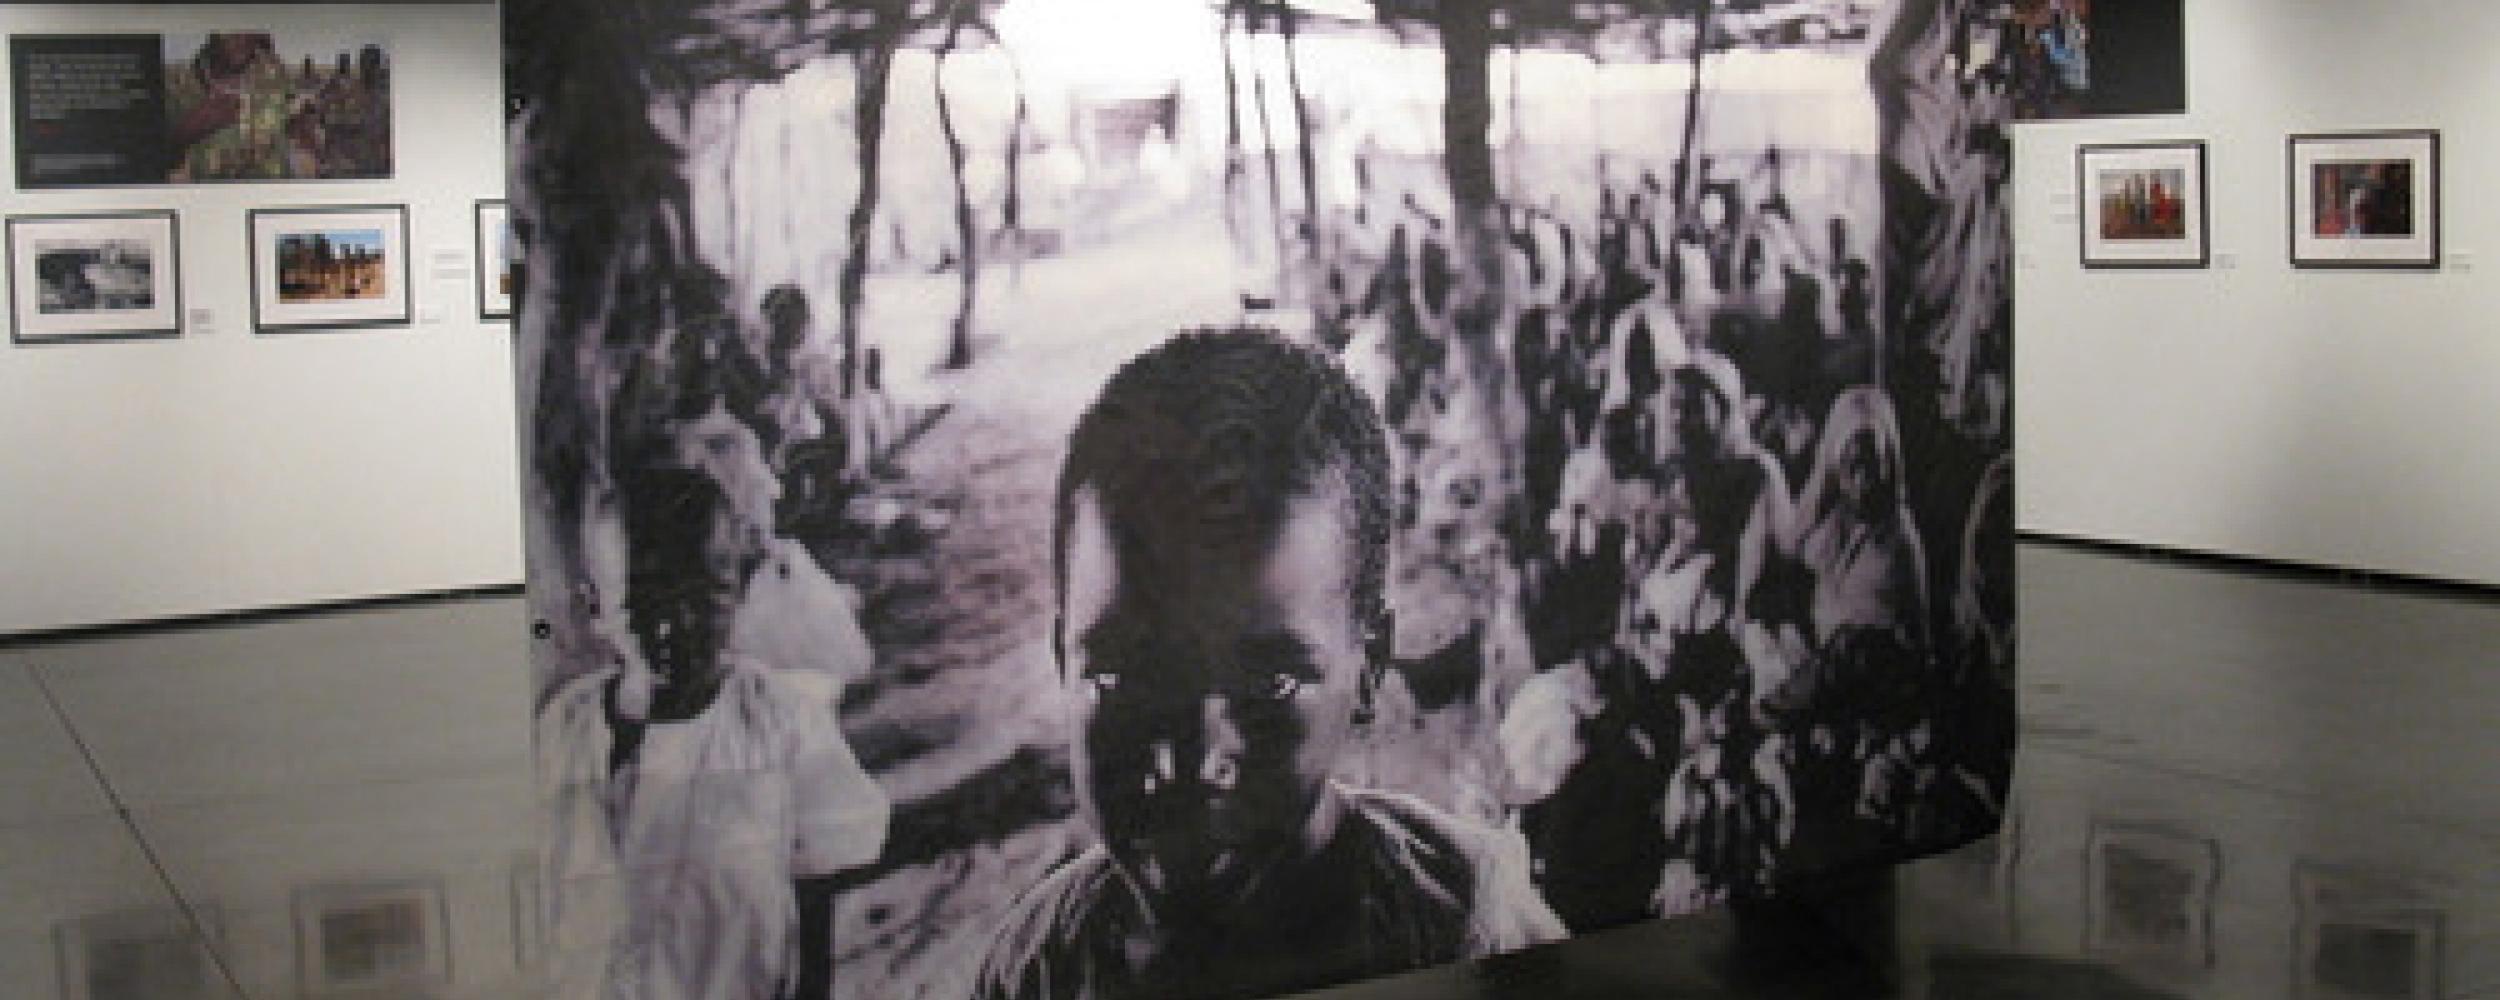 Darfur_Illonois_holocaust_museum_03.jpg